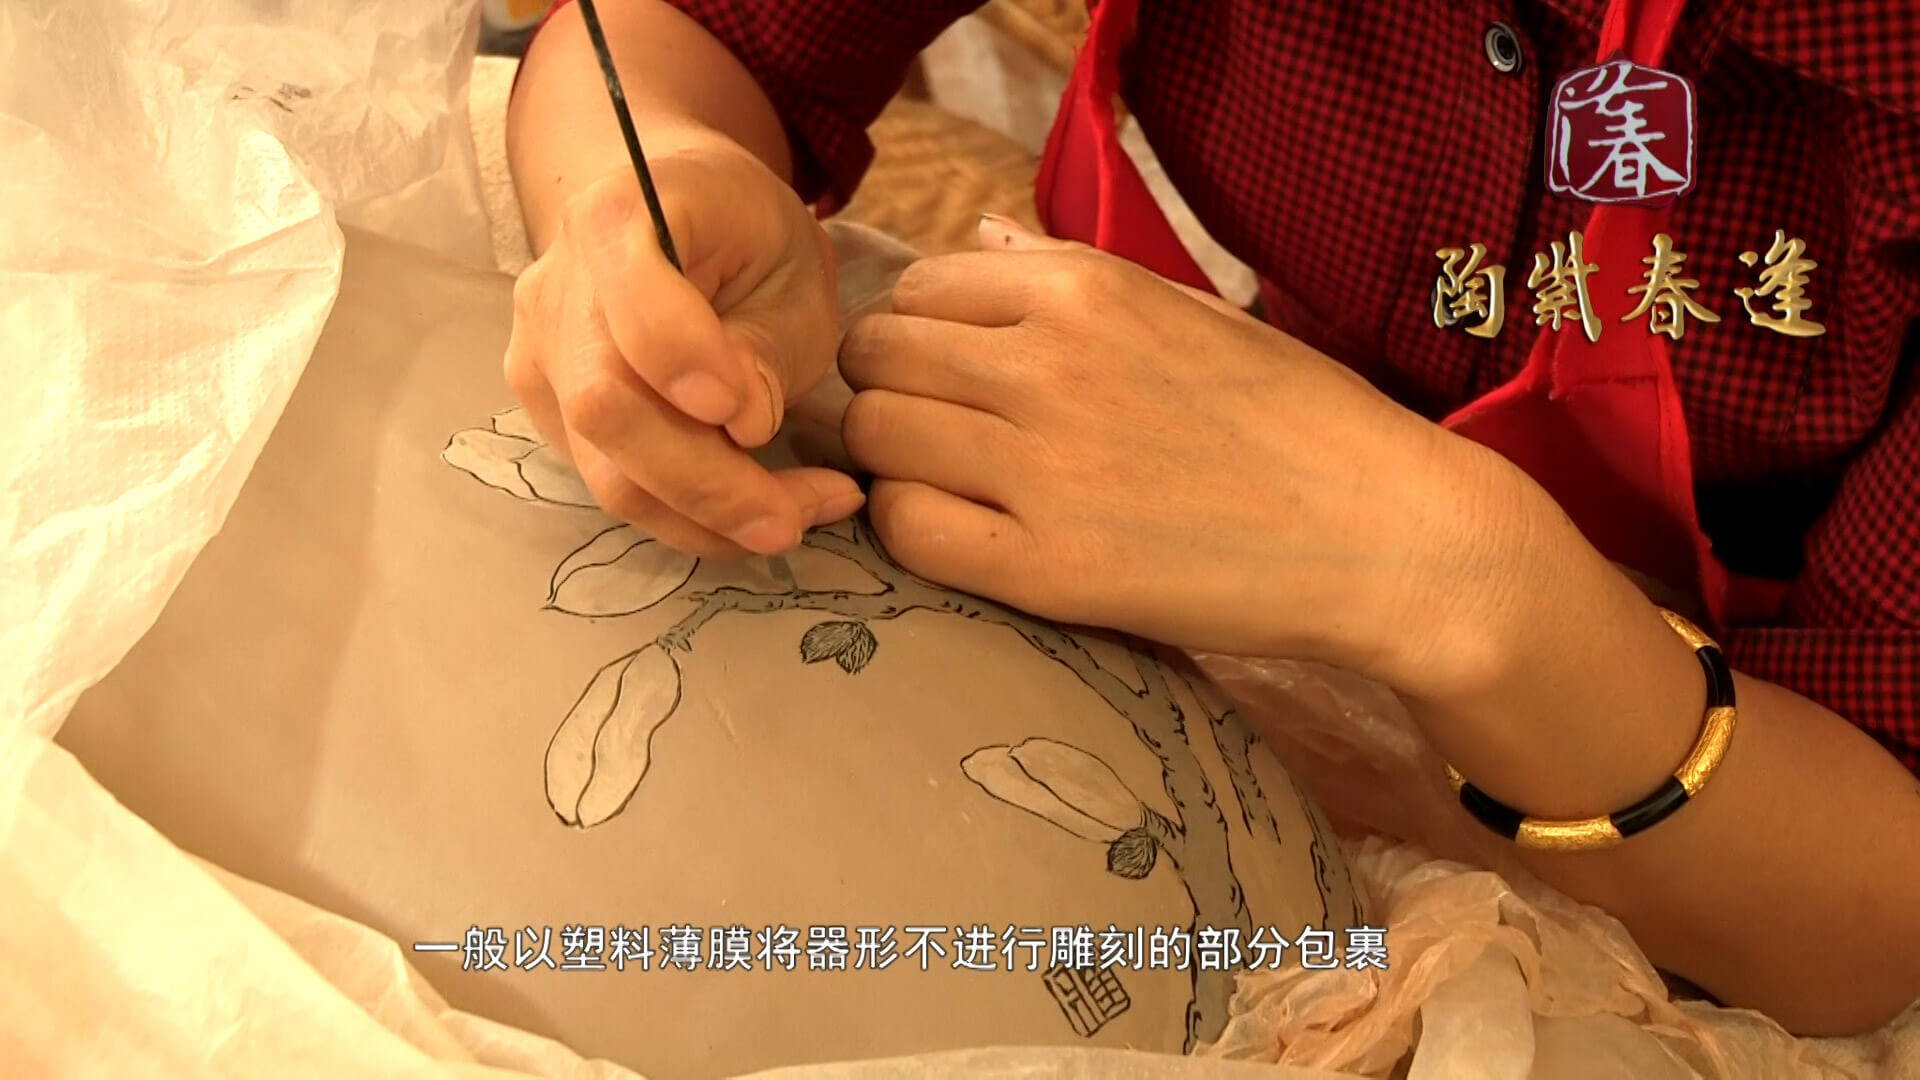 Creating Jian Shui Pottery - Carve Design